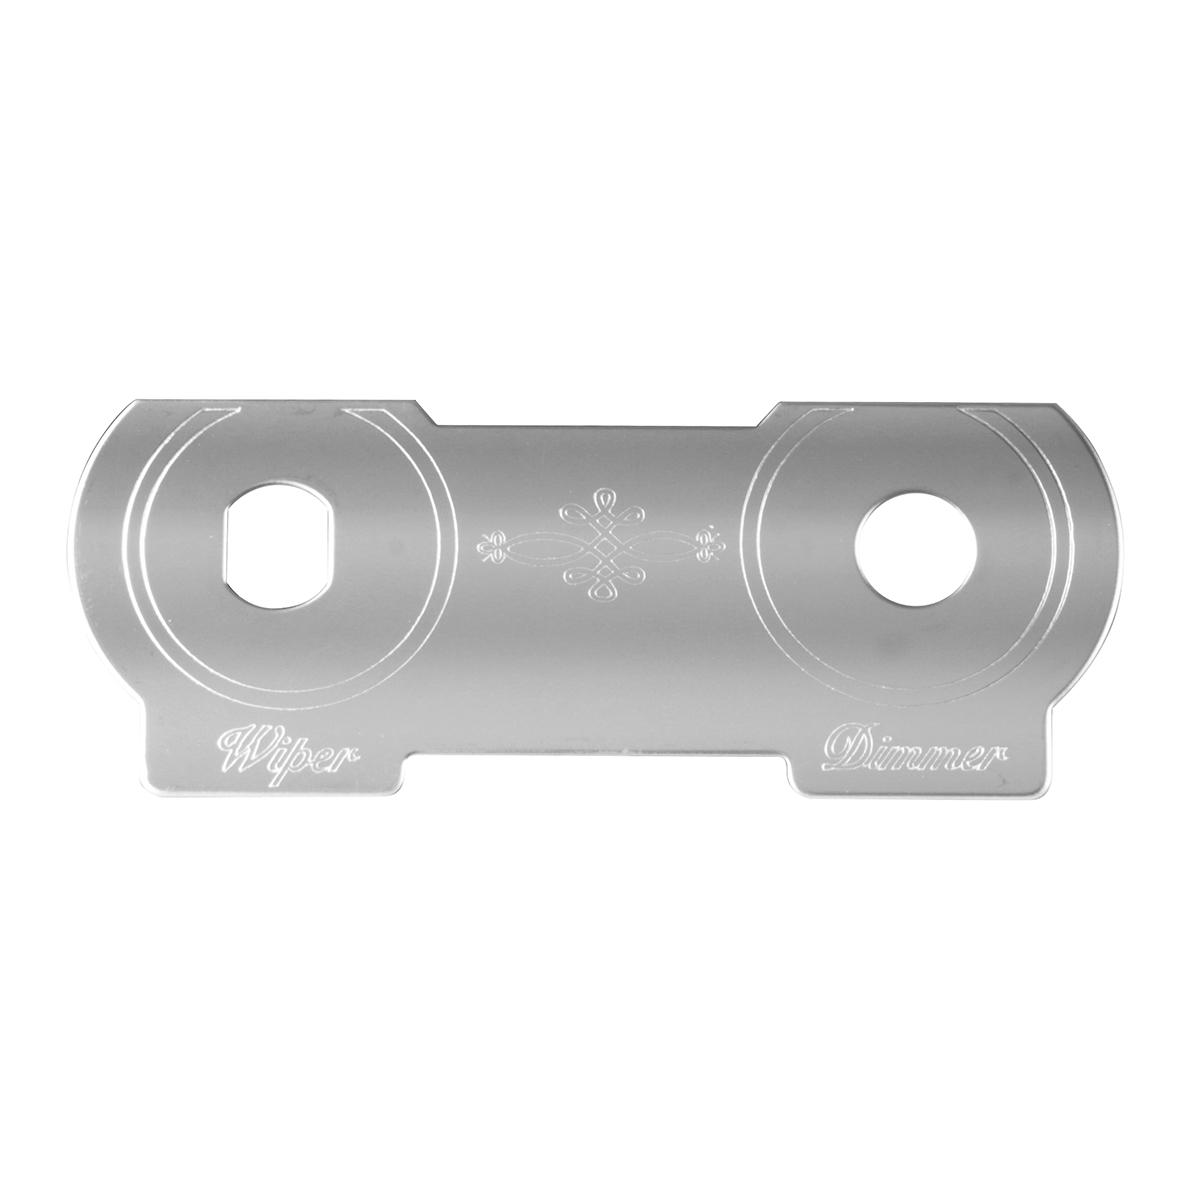 96041 Wiper/Dimmer Dash Plate for Peterbilt 379